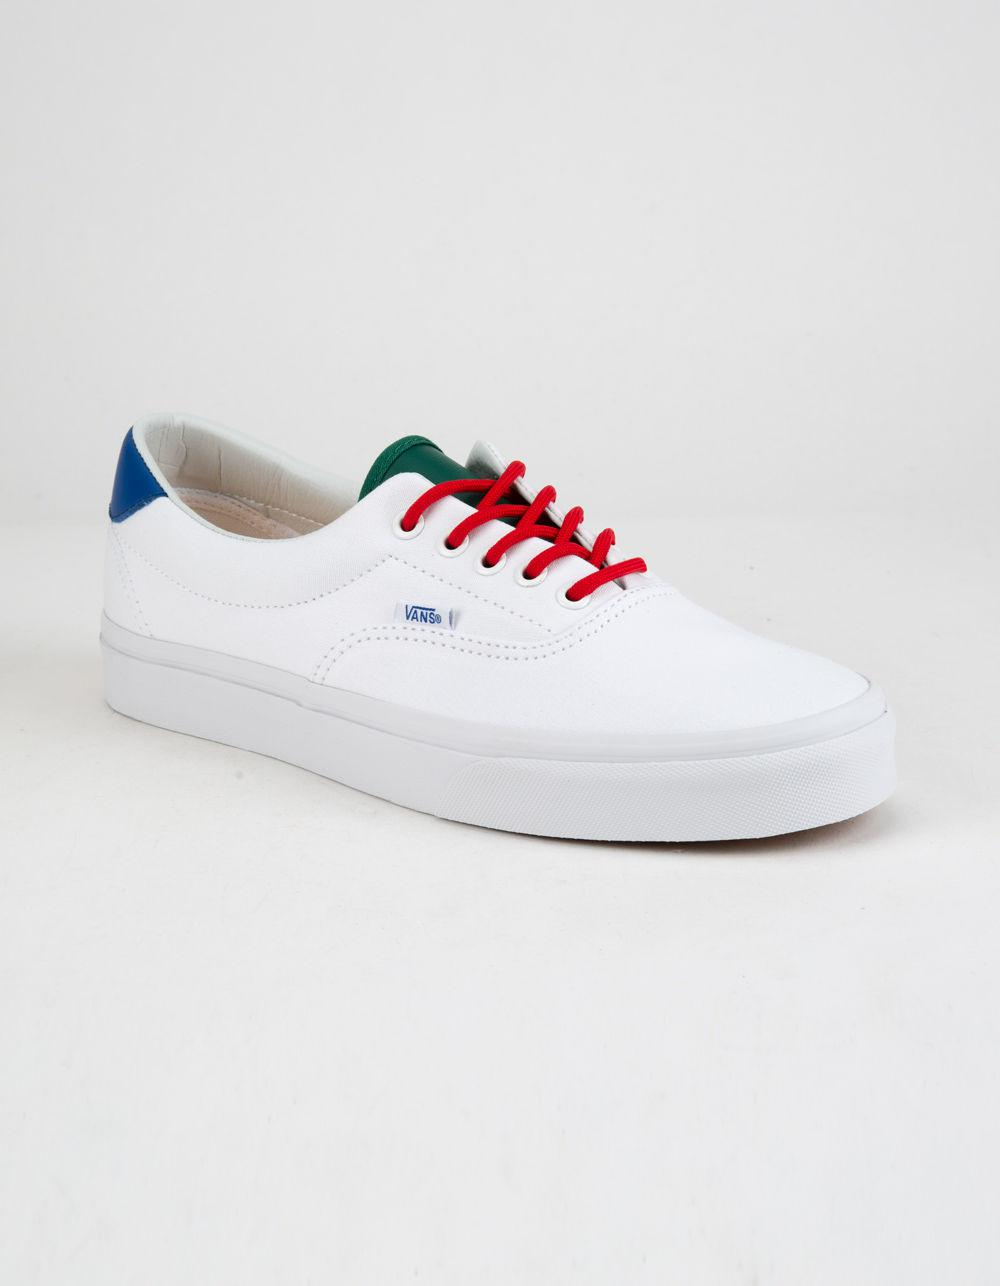 8eb2174b6b Lyst - Vans Yacht Club Era 59 True White Mens Shoes in White for Men